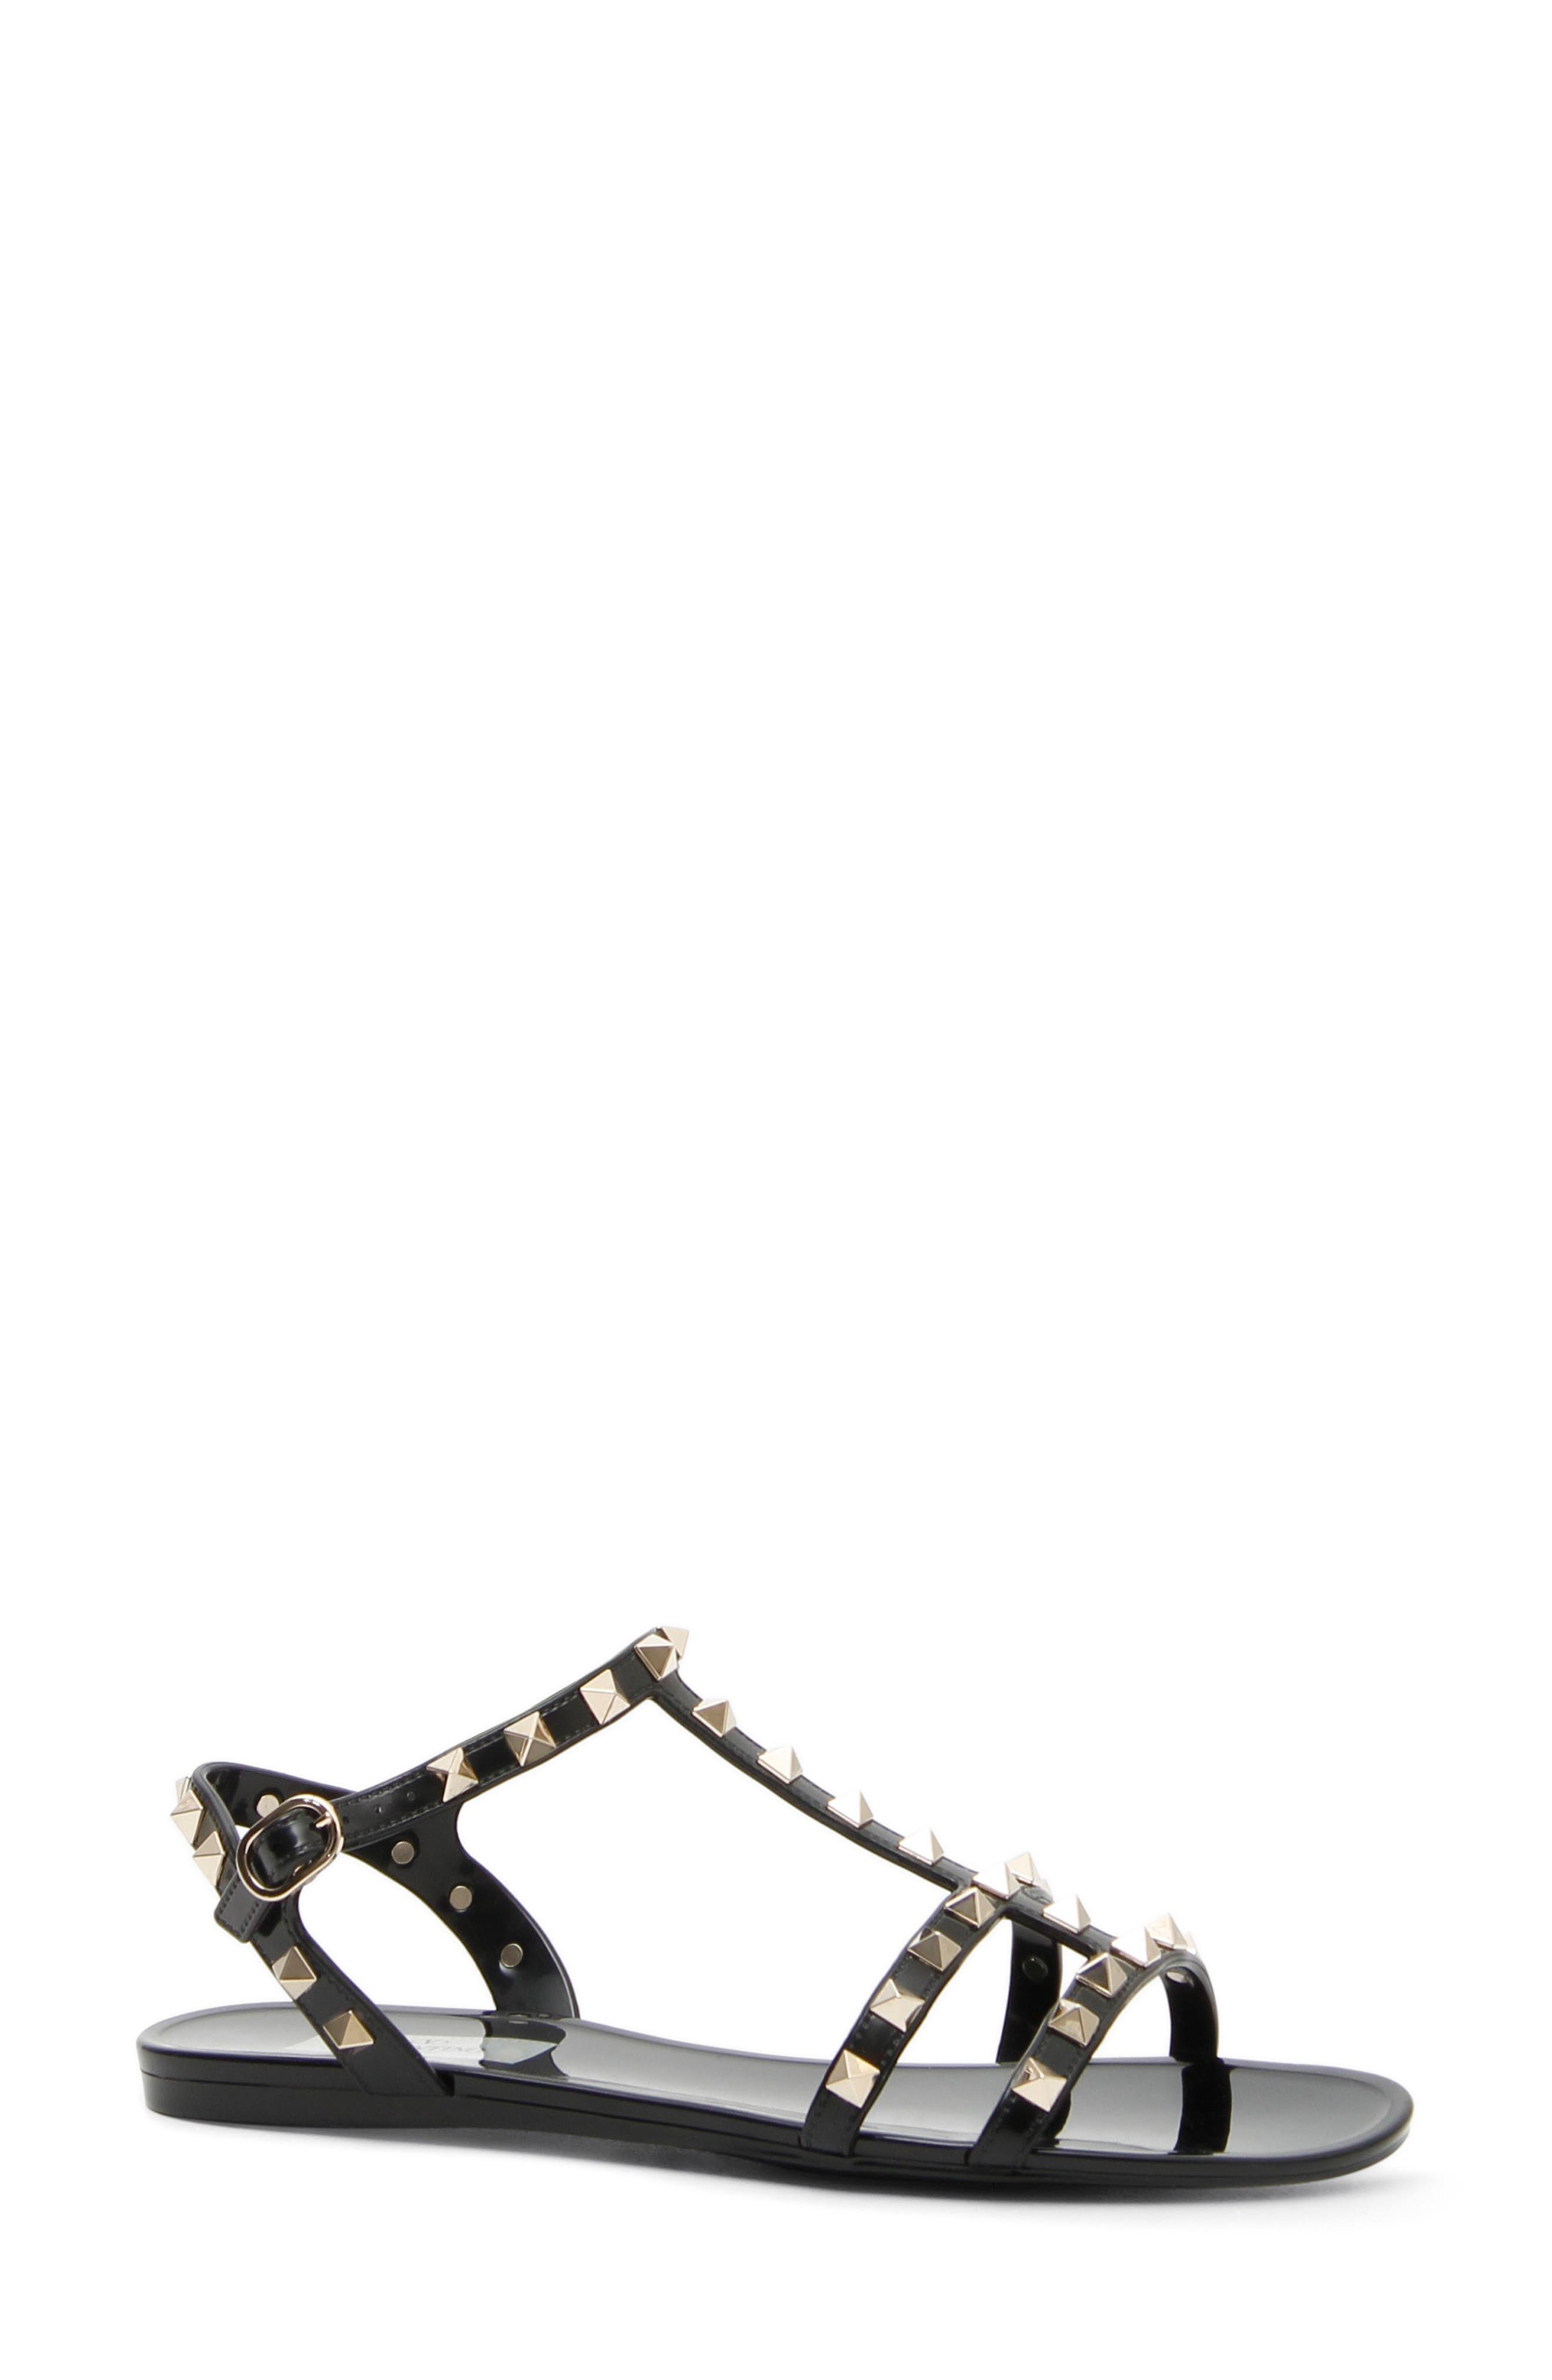 Alternate Image 1 Selected - VALENTINO GARAVANI Rockstud T-Strap Sandal (Women)